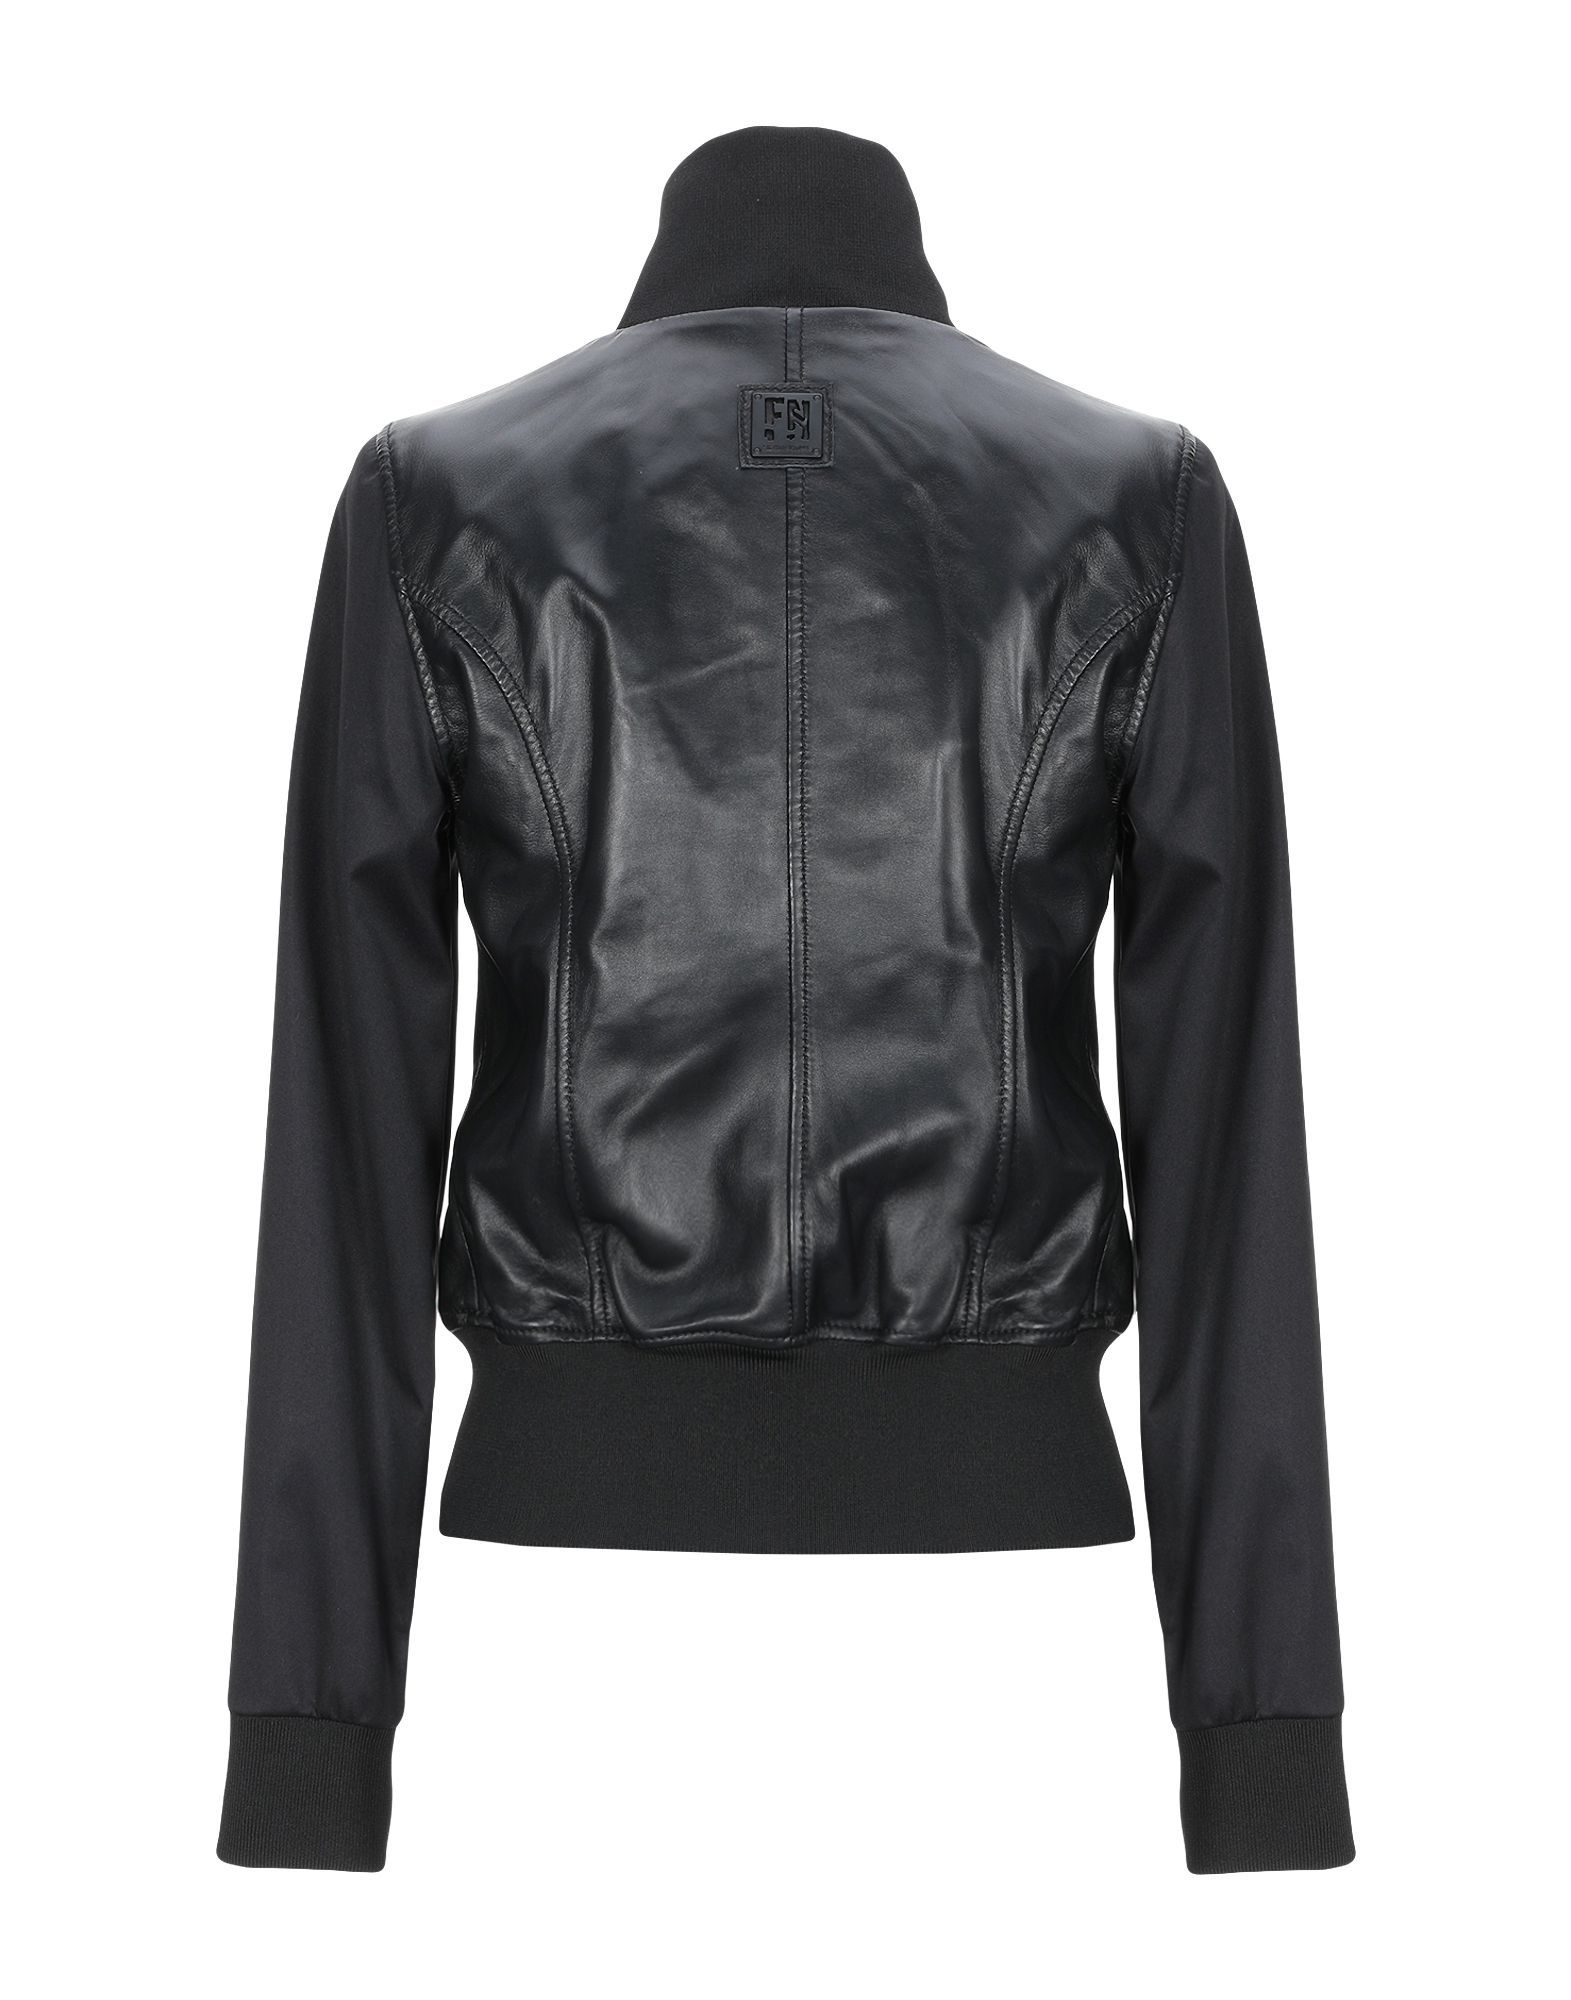 Coat & Jackets Freaky Nation Black Women's Leather